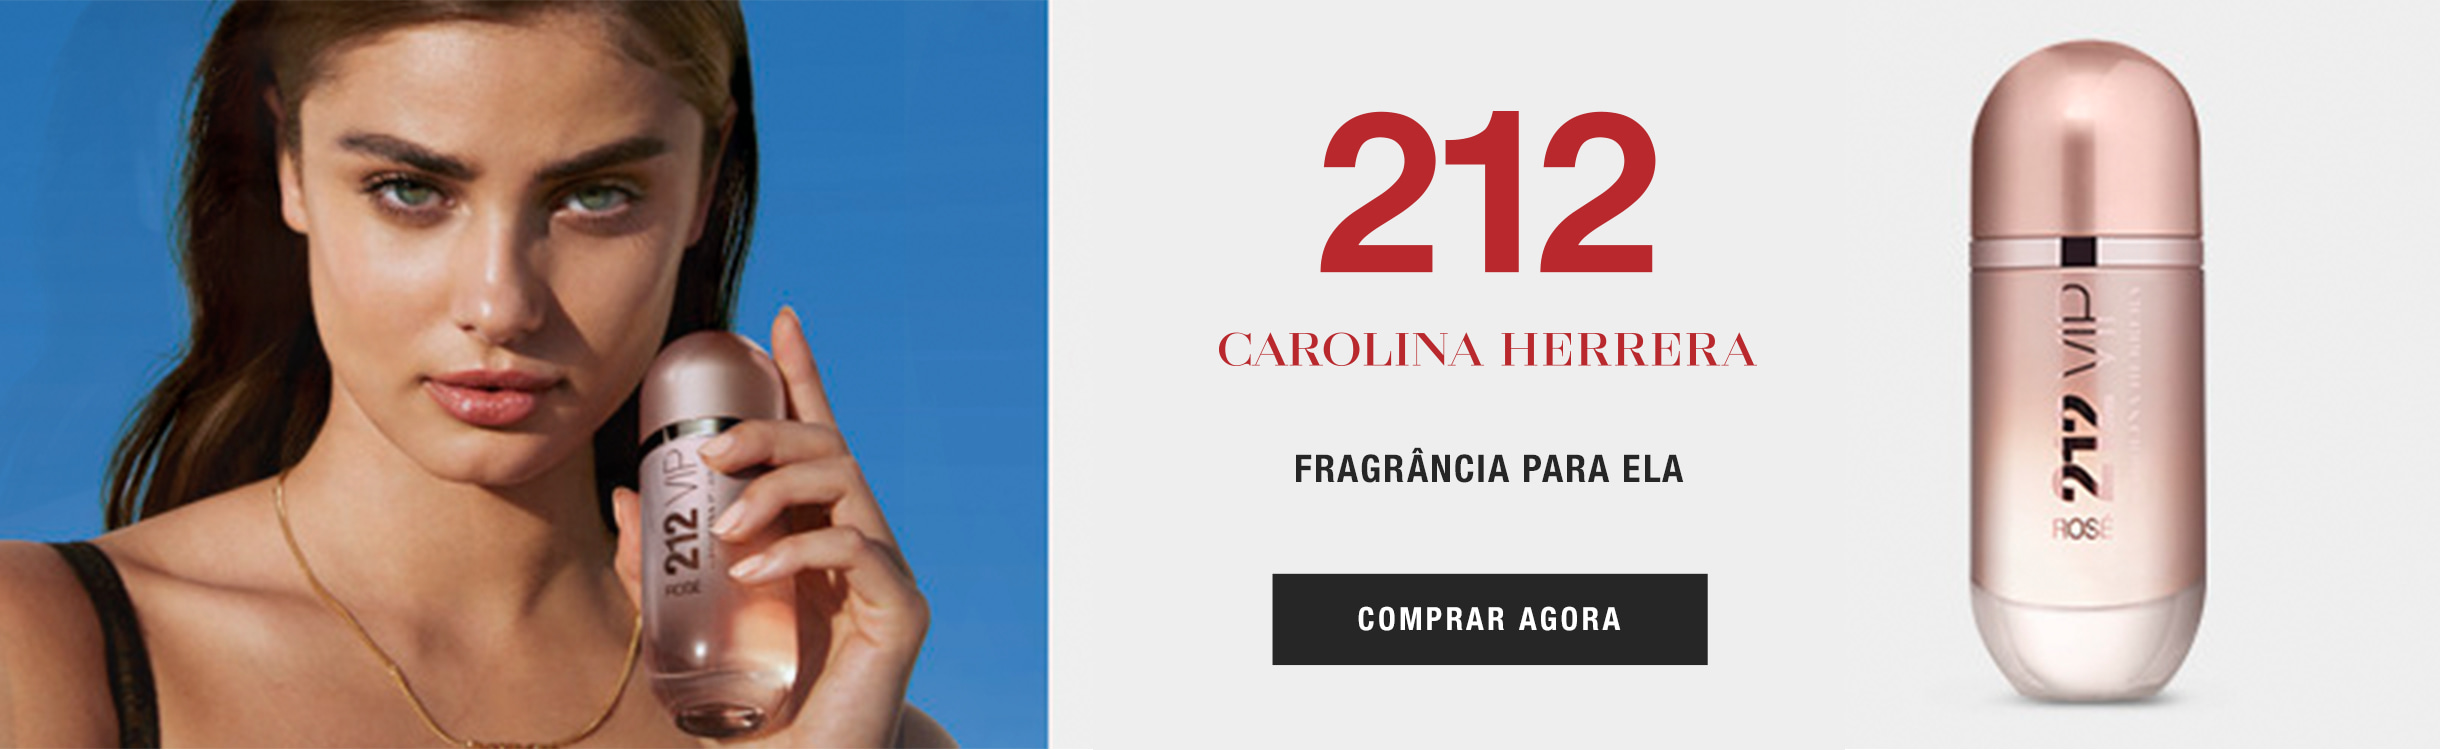 Perfumes e Perfumaria Carolina Herrera Femininos